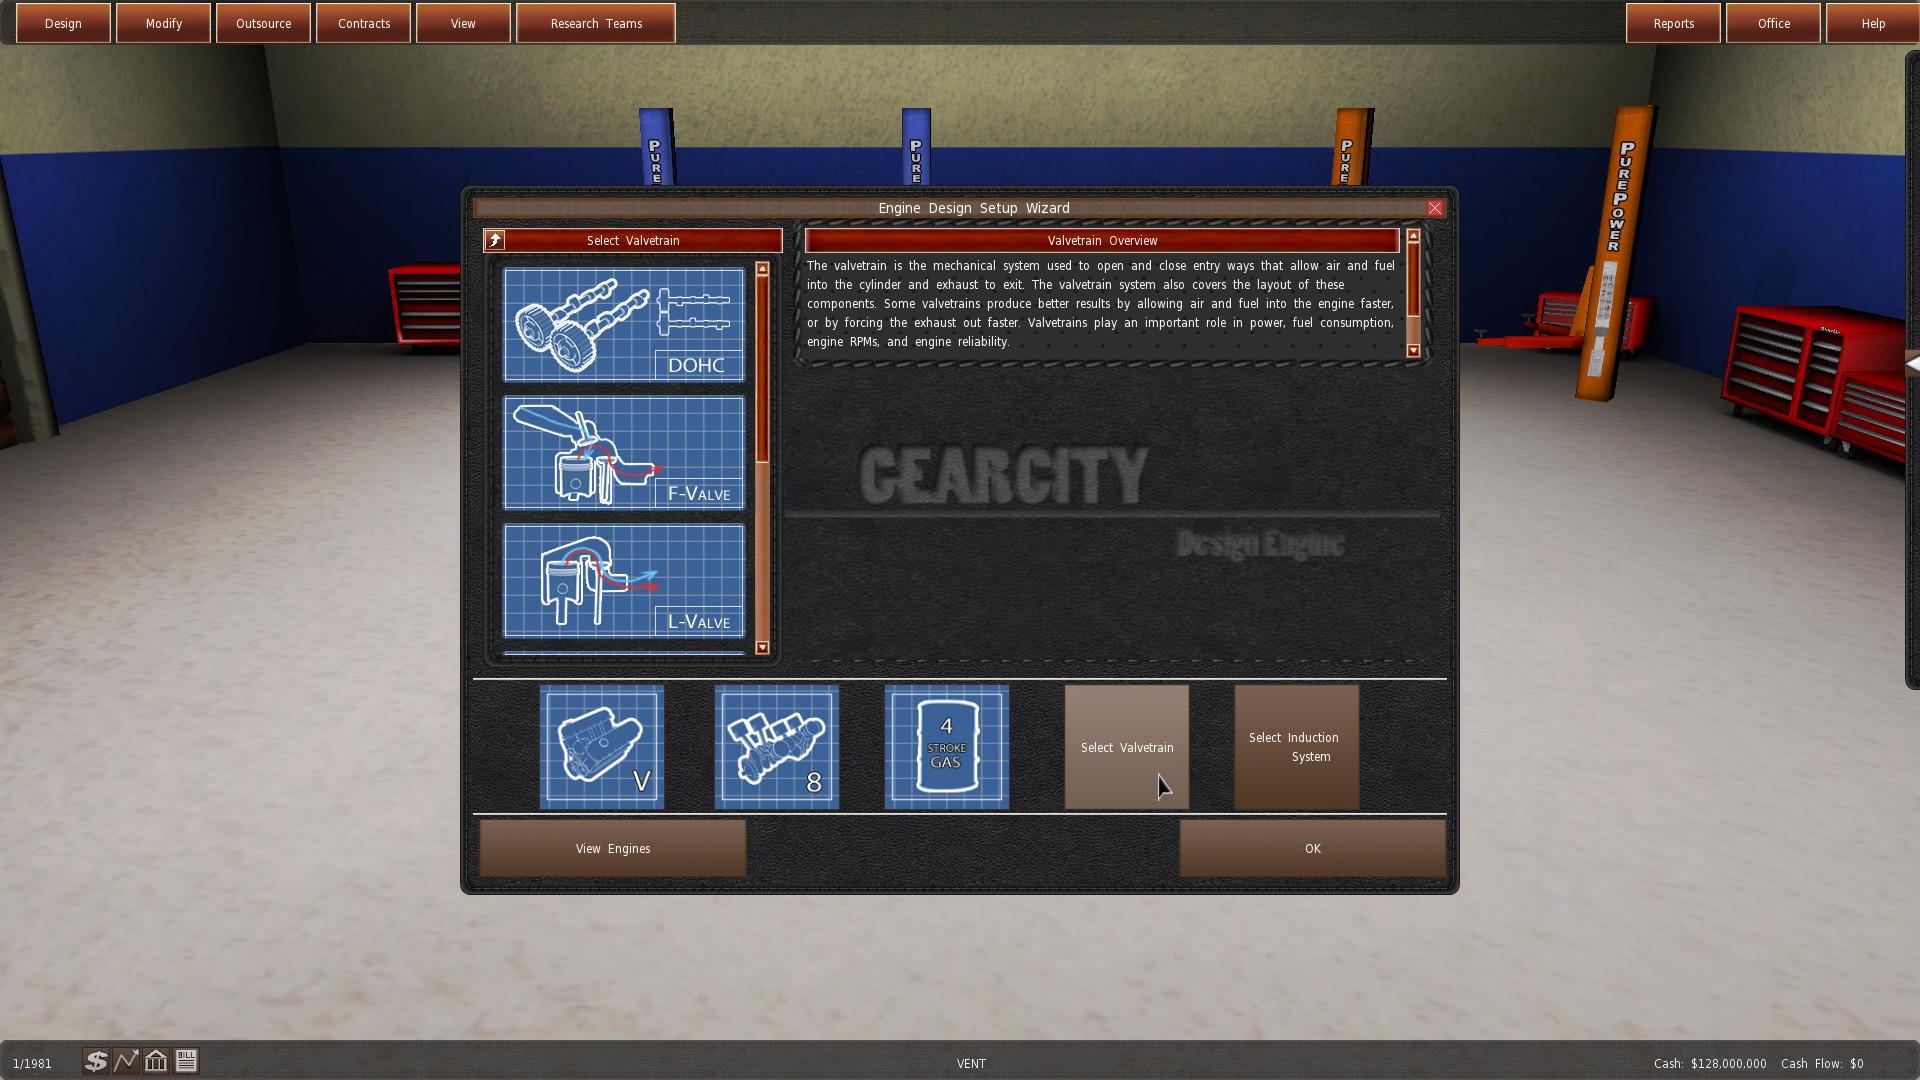 steam で 25 オフ gearcity